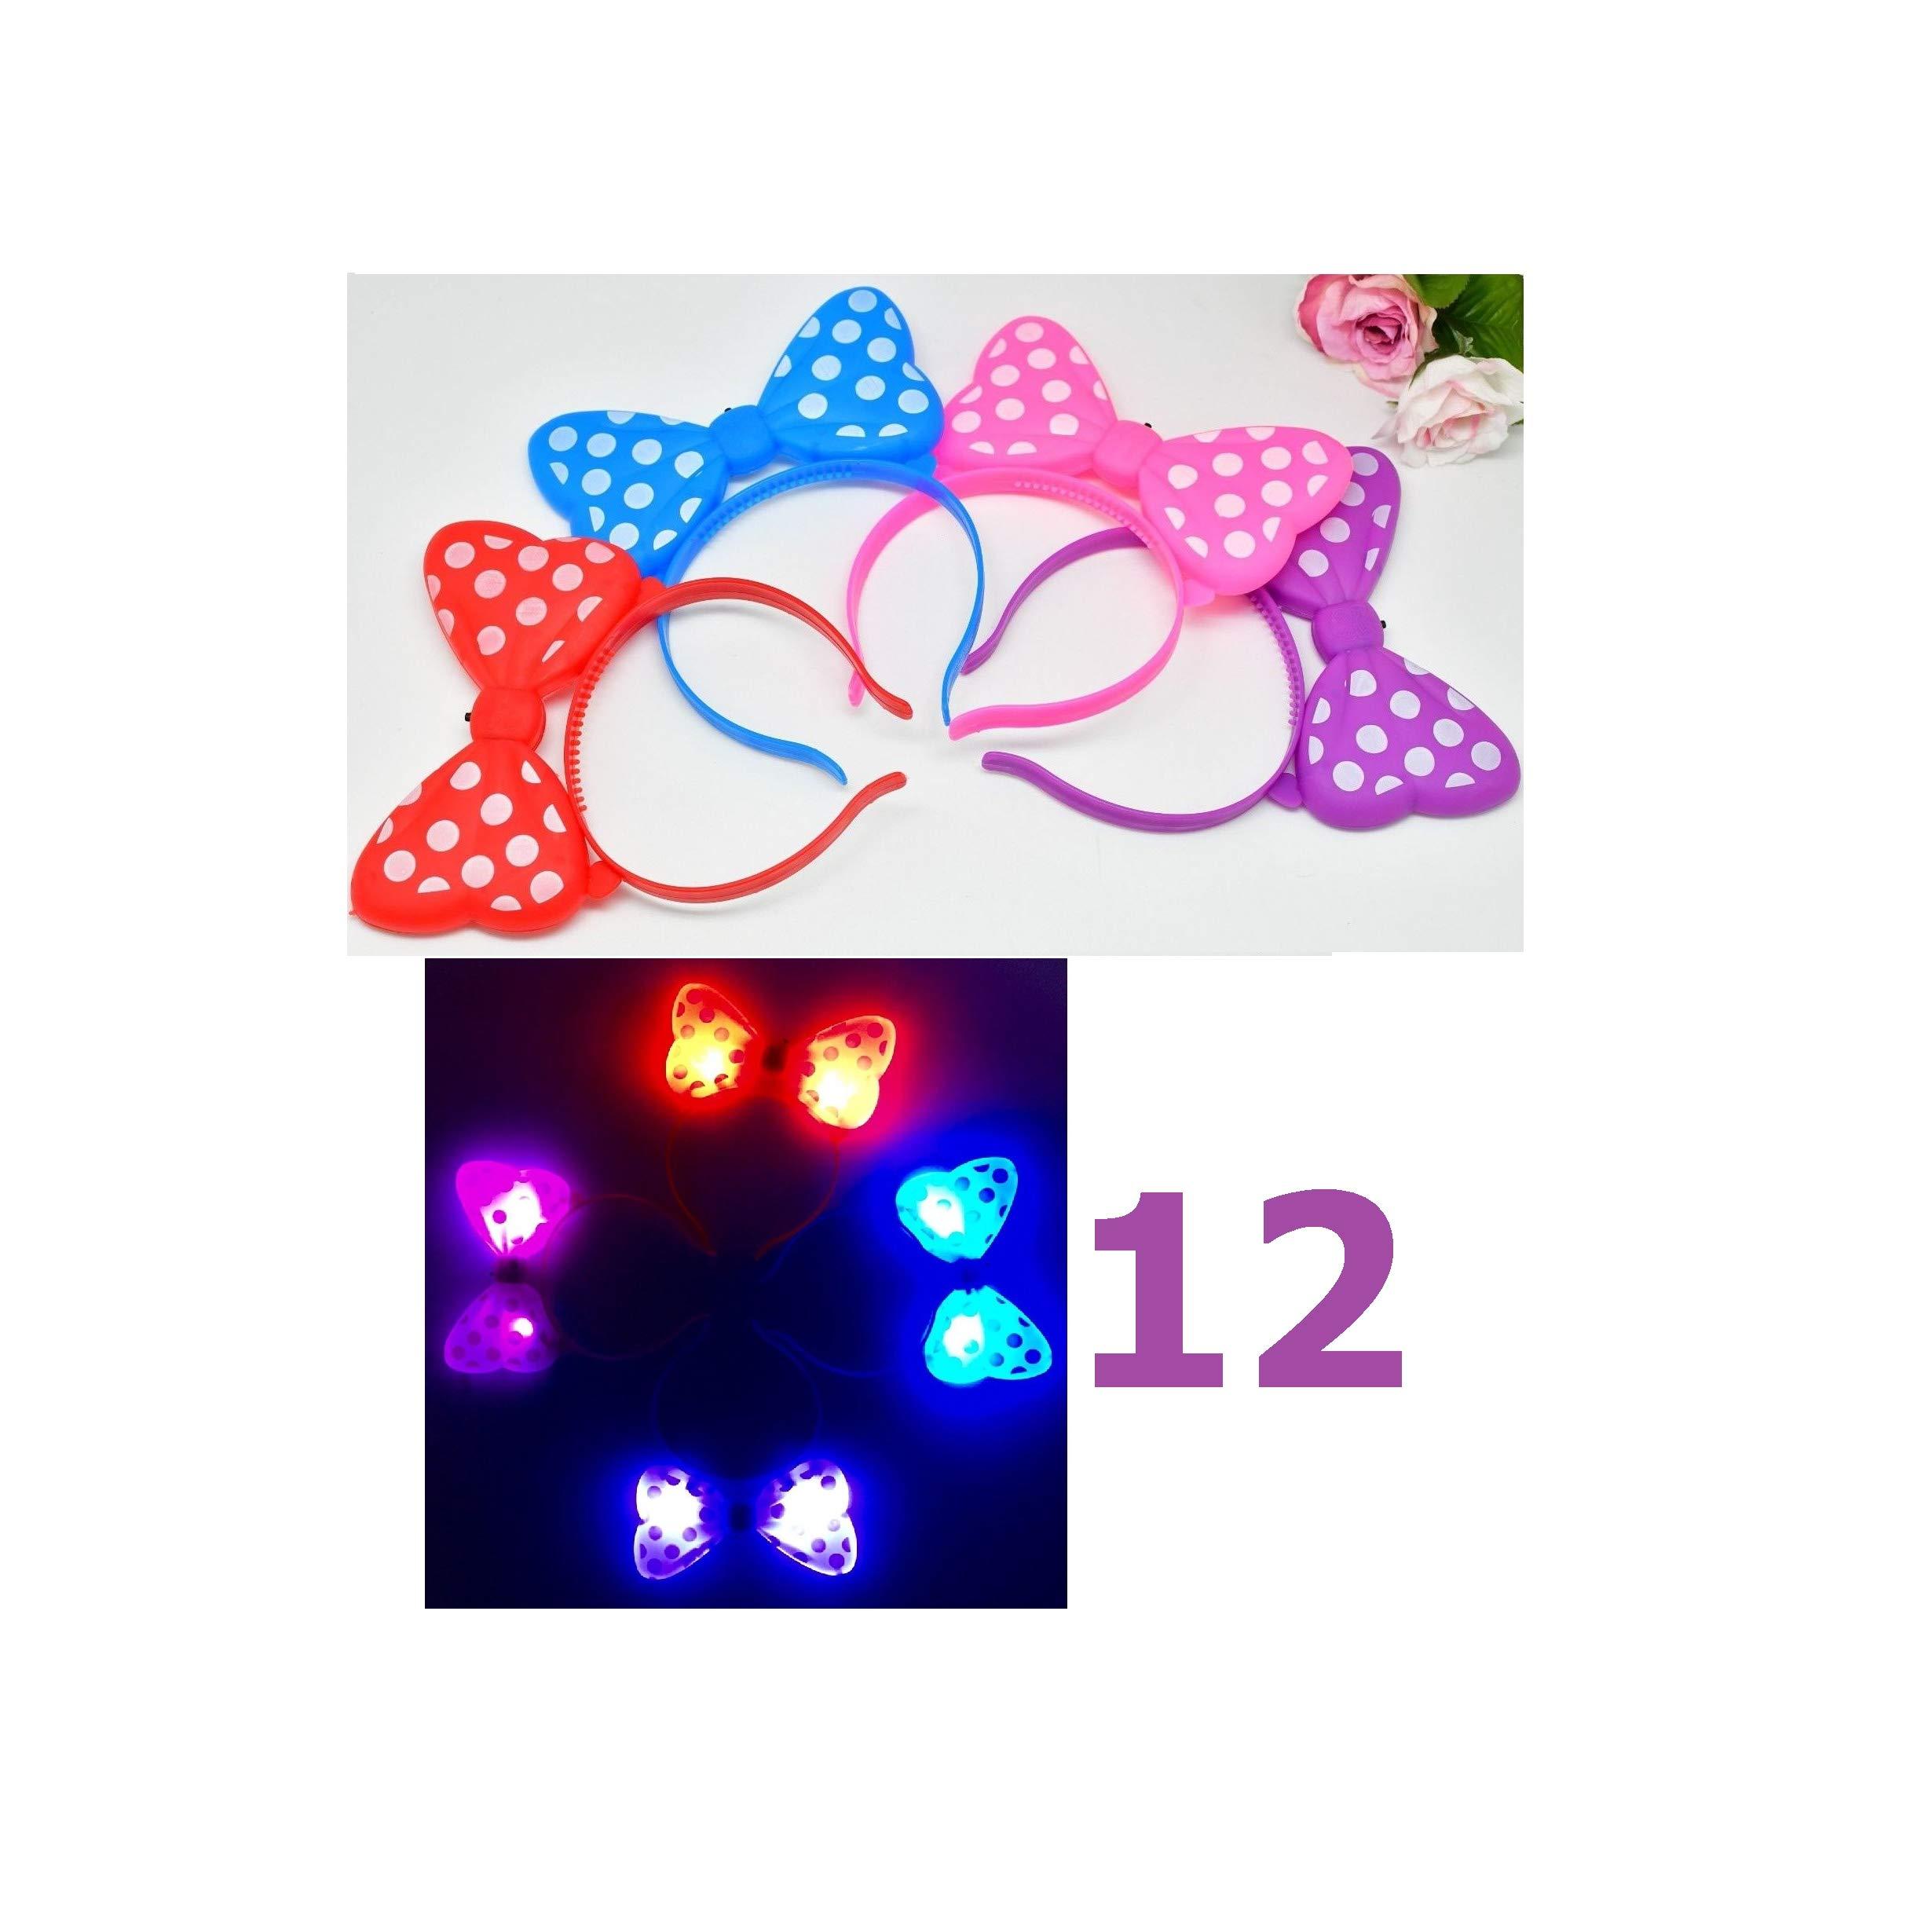 Dozen Jumbo Bows LED Headbands Minnie Mouse Light Party Love Gift Rave Flashing Favors Quick Arrive